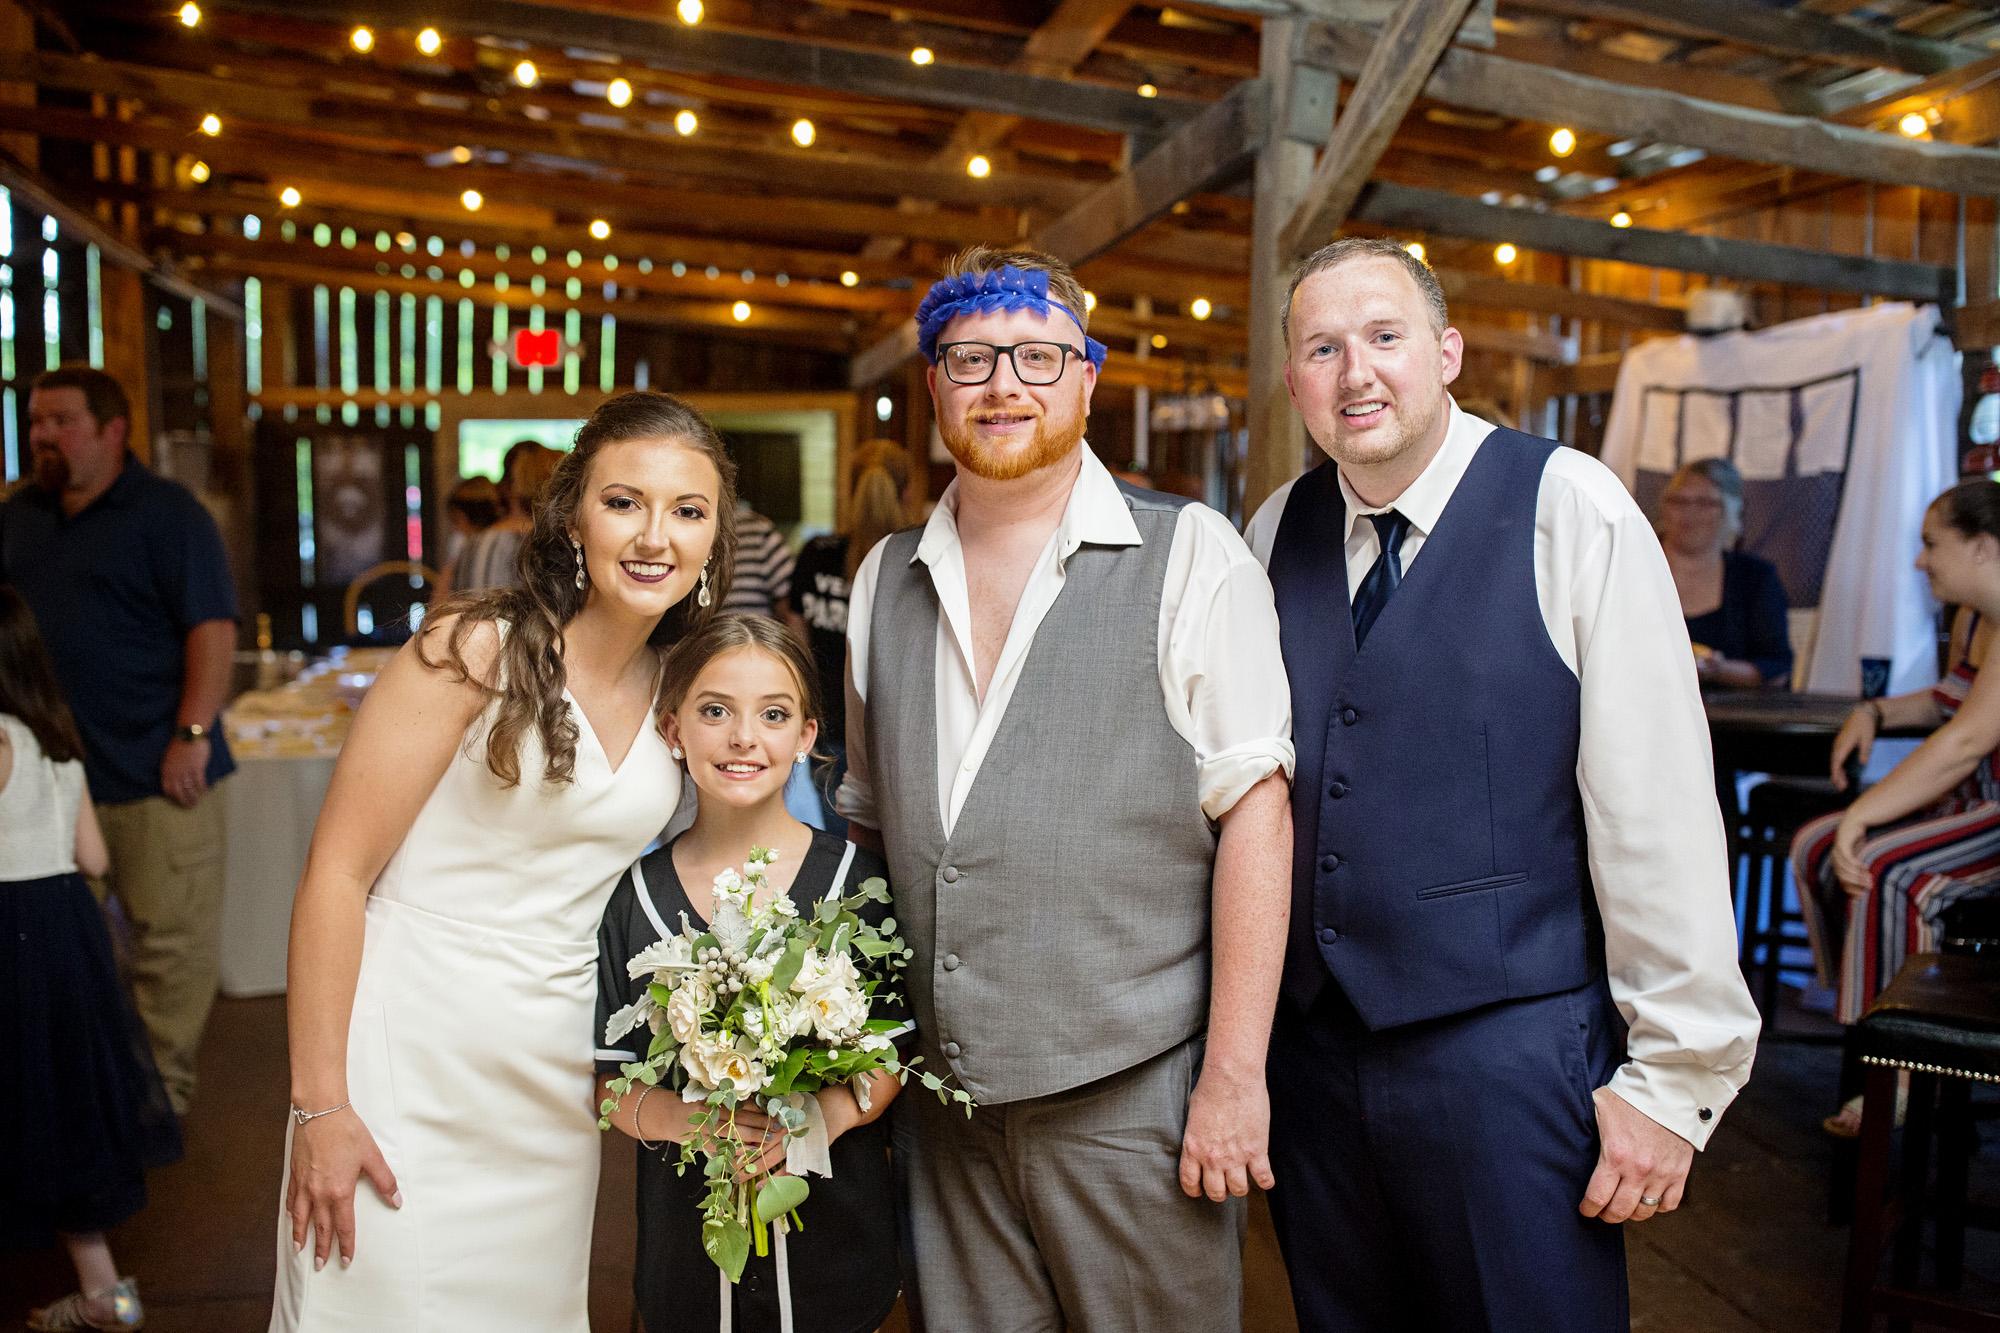 Seriously_Sabrina_Photography_Red_River_Gorge_Wedding_Barn_Robinson109.jpg